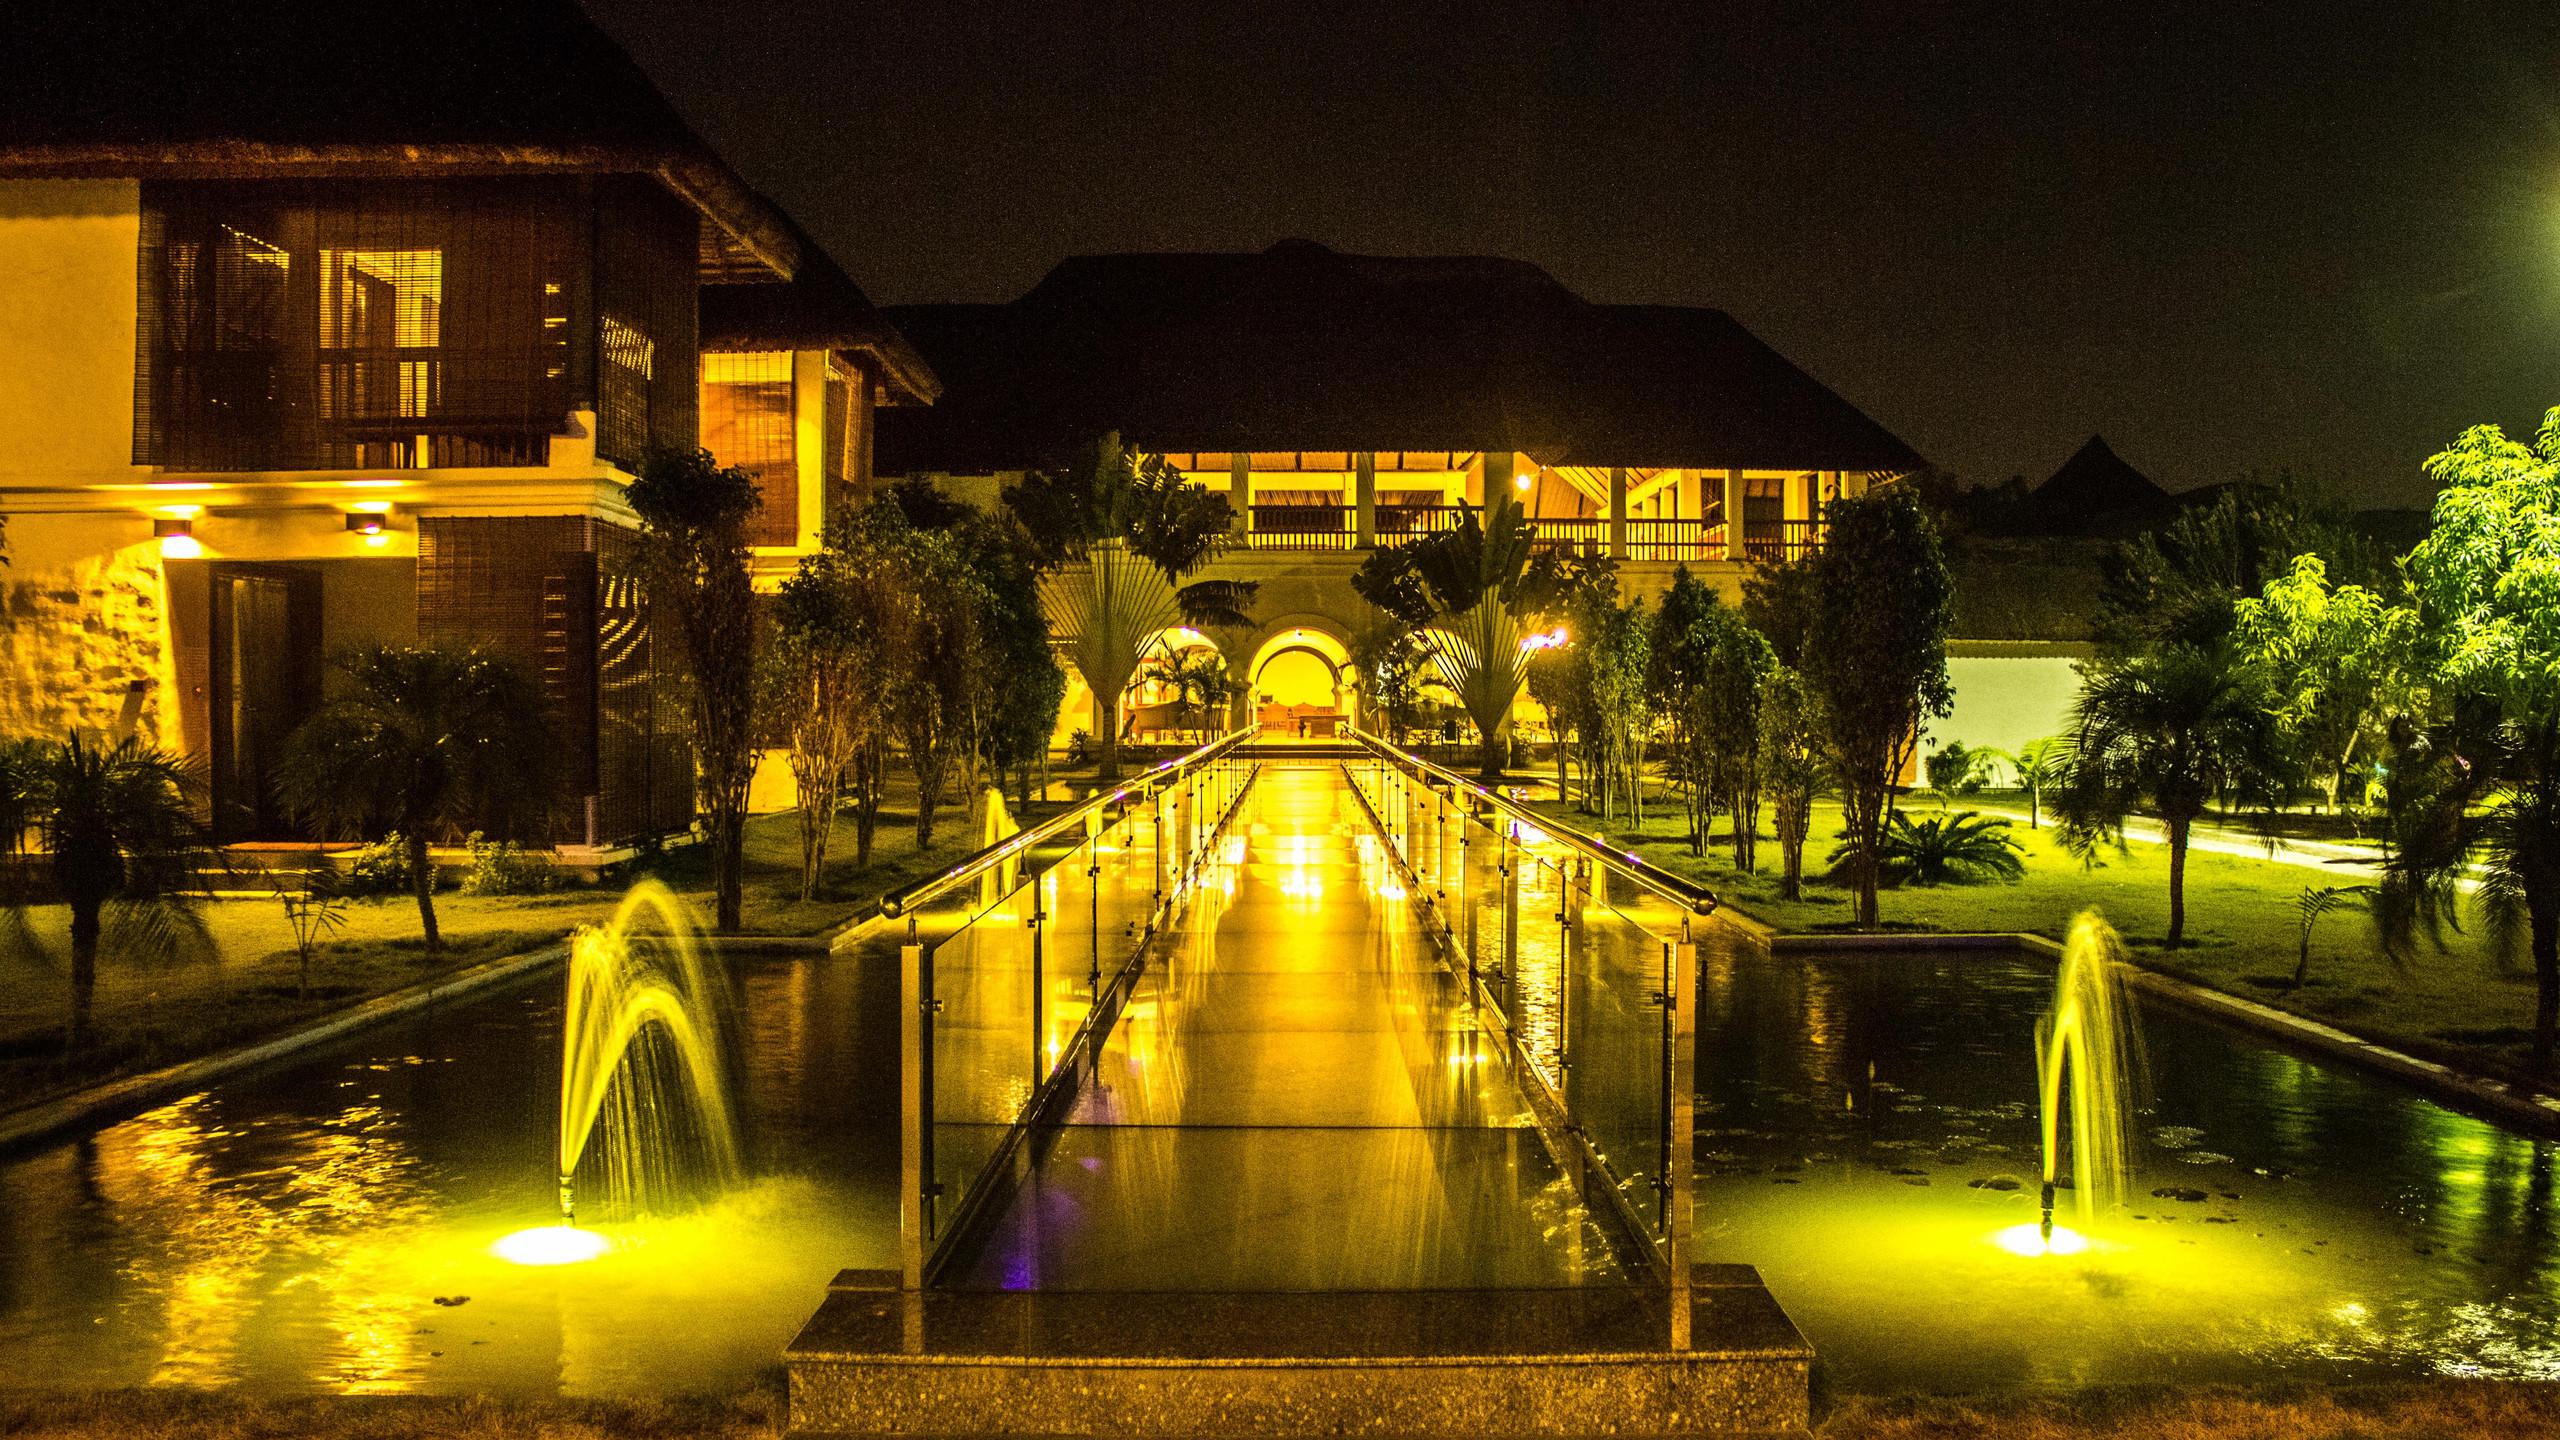 Lighting_Le Pondy_Fairytale Travel Blog (9)